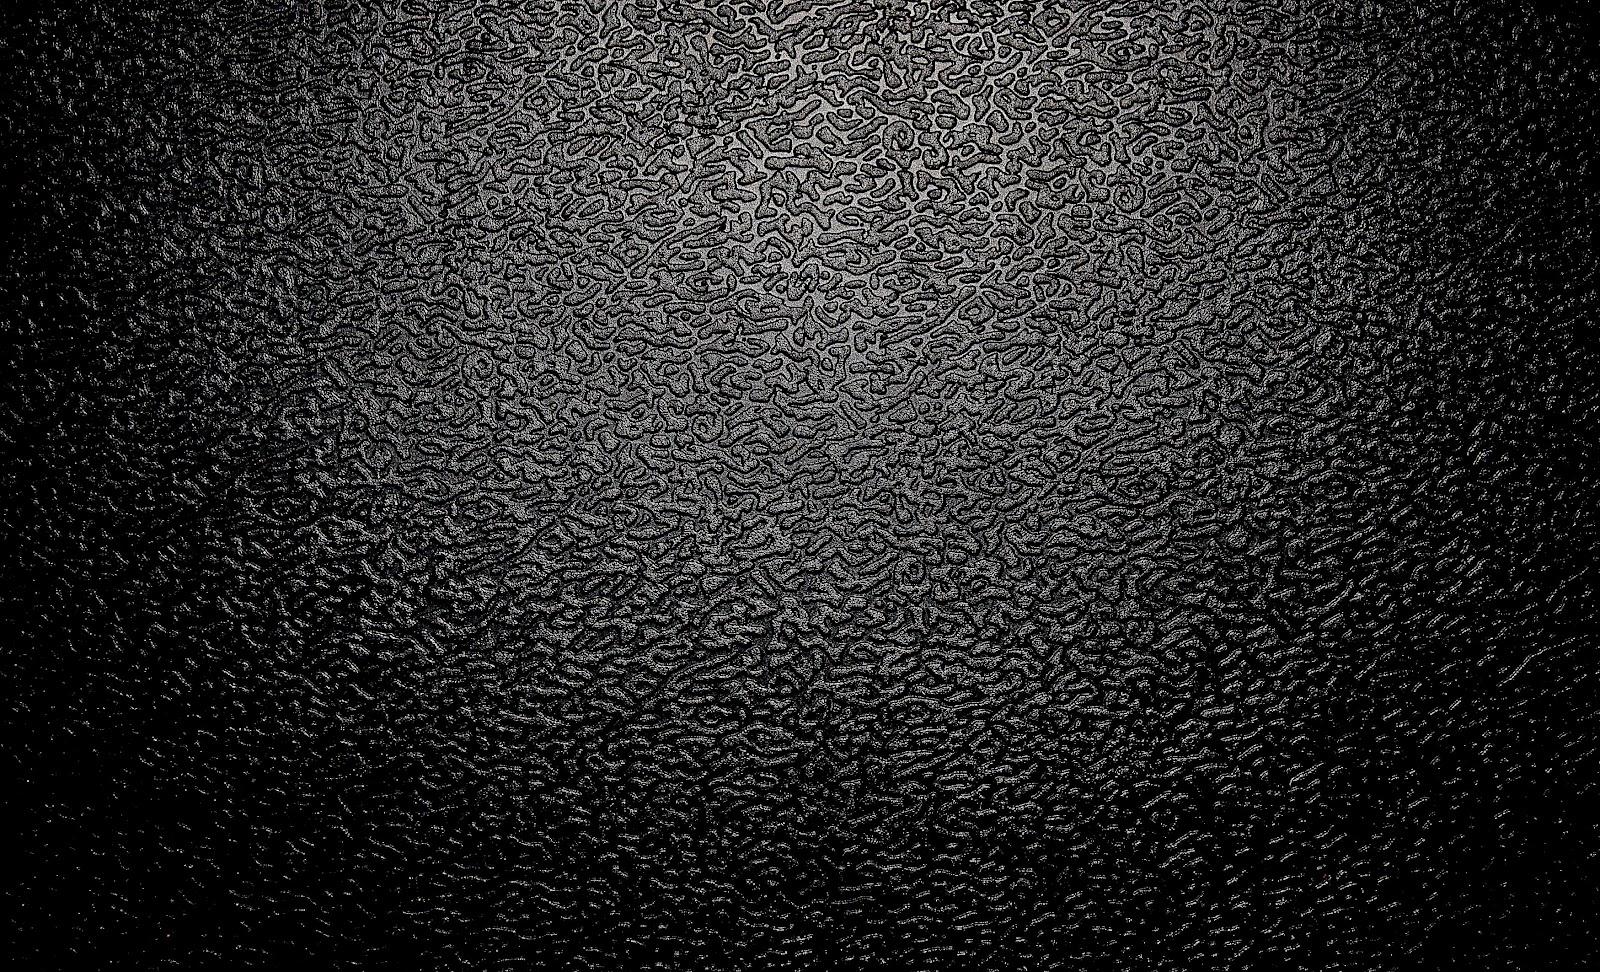 Black Textured Wallpaper Cool HD Wallpapers